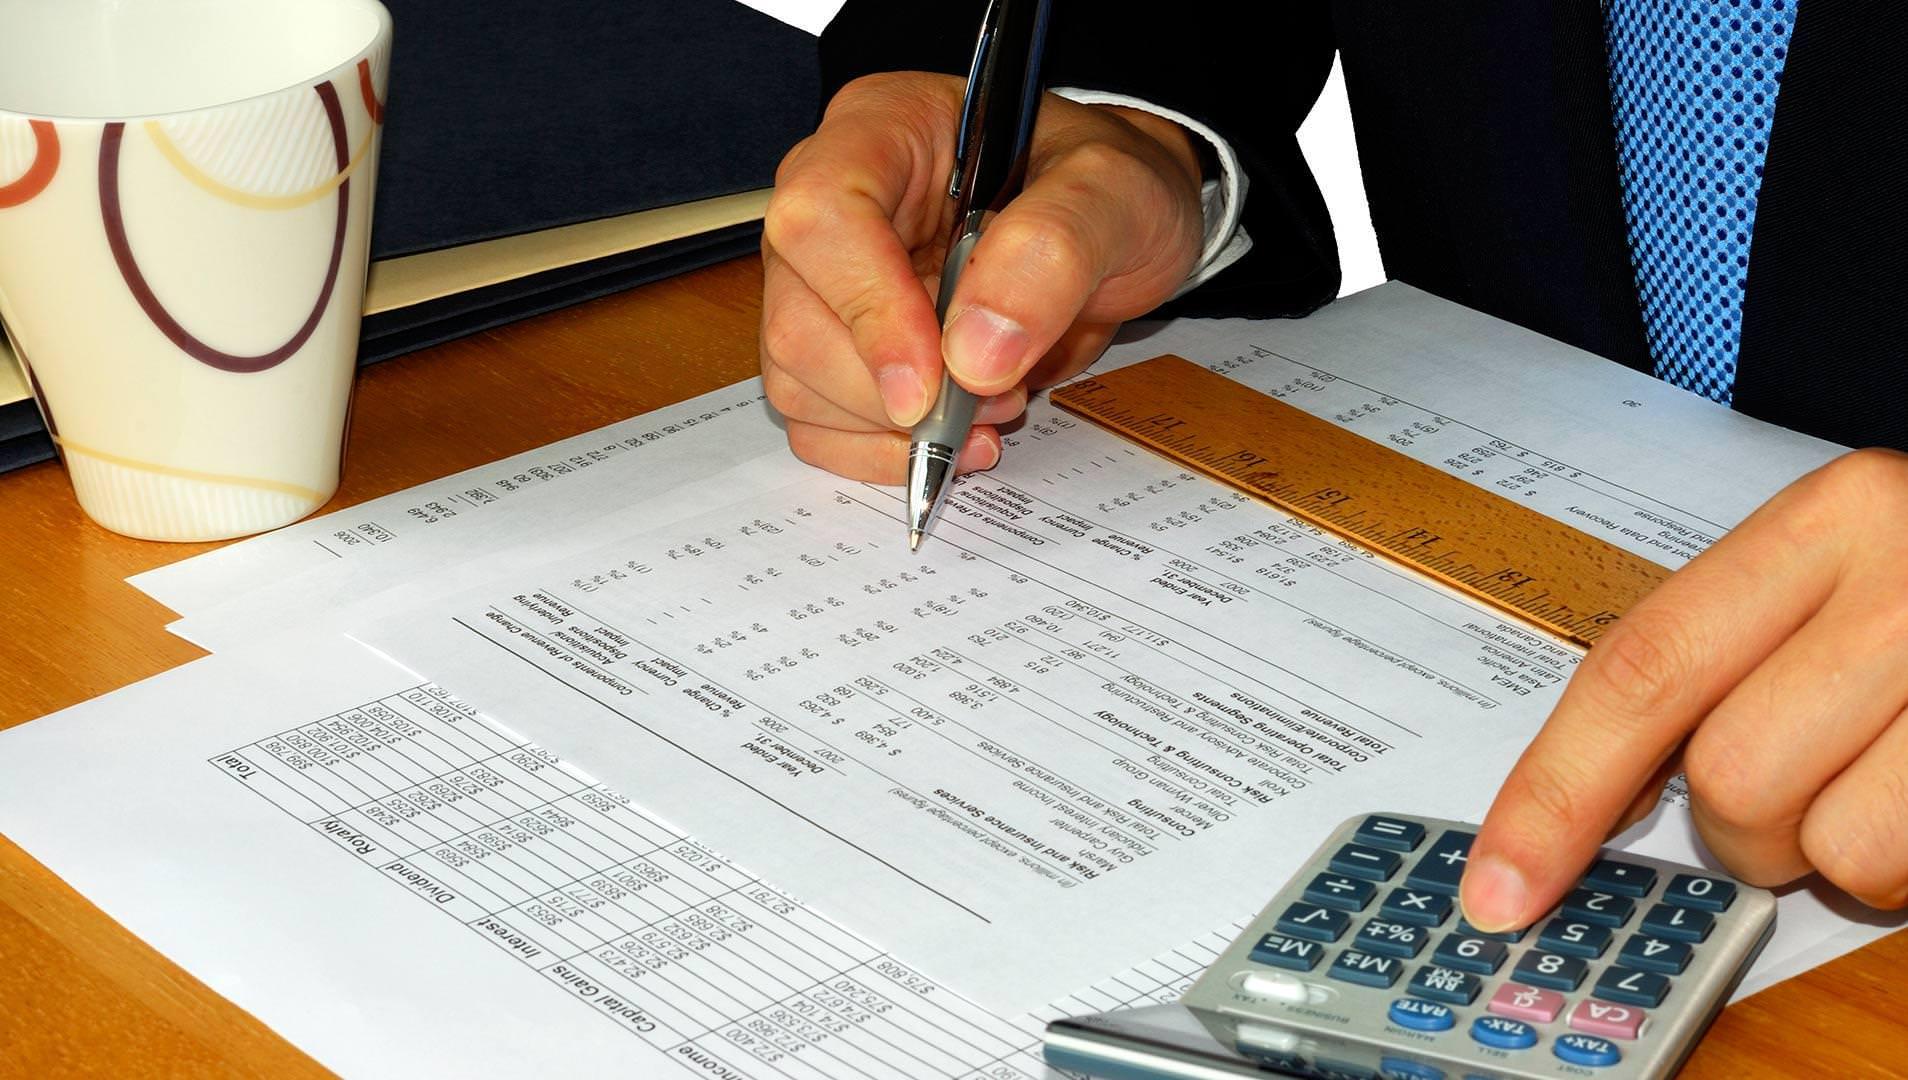 Finance & Banking: Jobs in Israel | Nefesh B'Nefesh